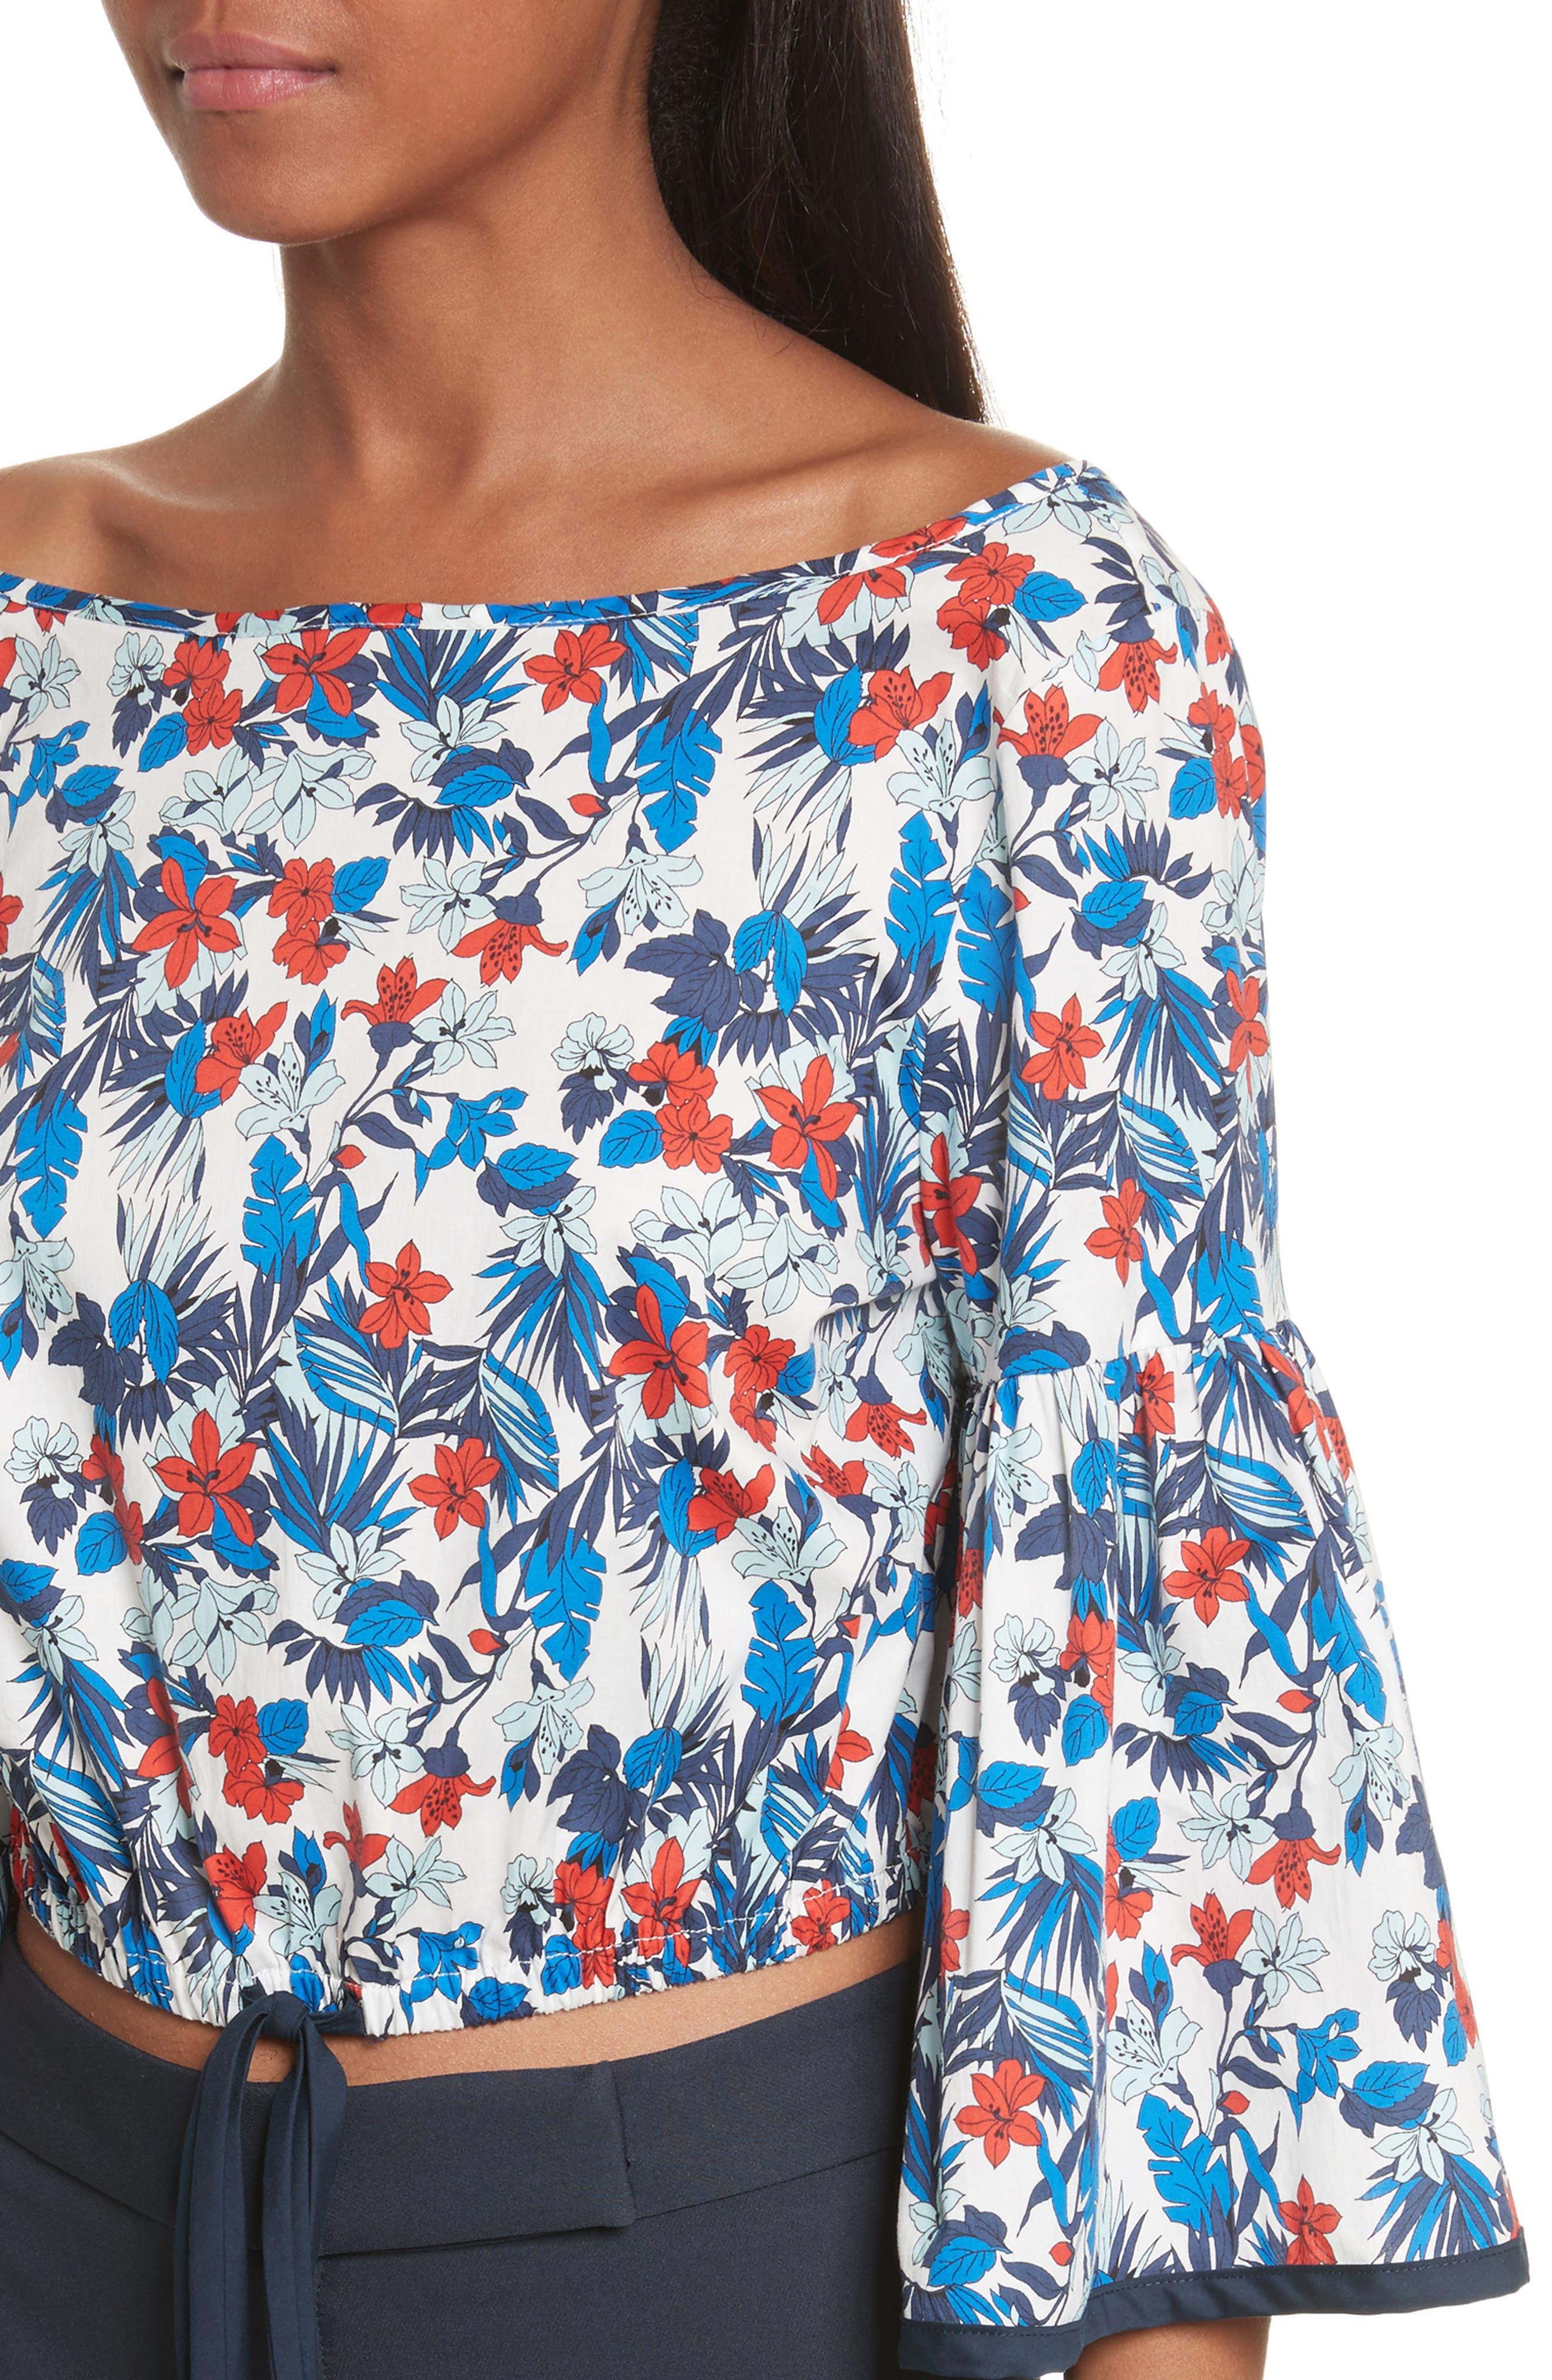 Hibiscus Print Stretch Cotton Top,                             Alternate thumbnail 4, color,                             433